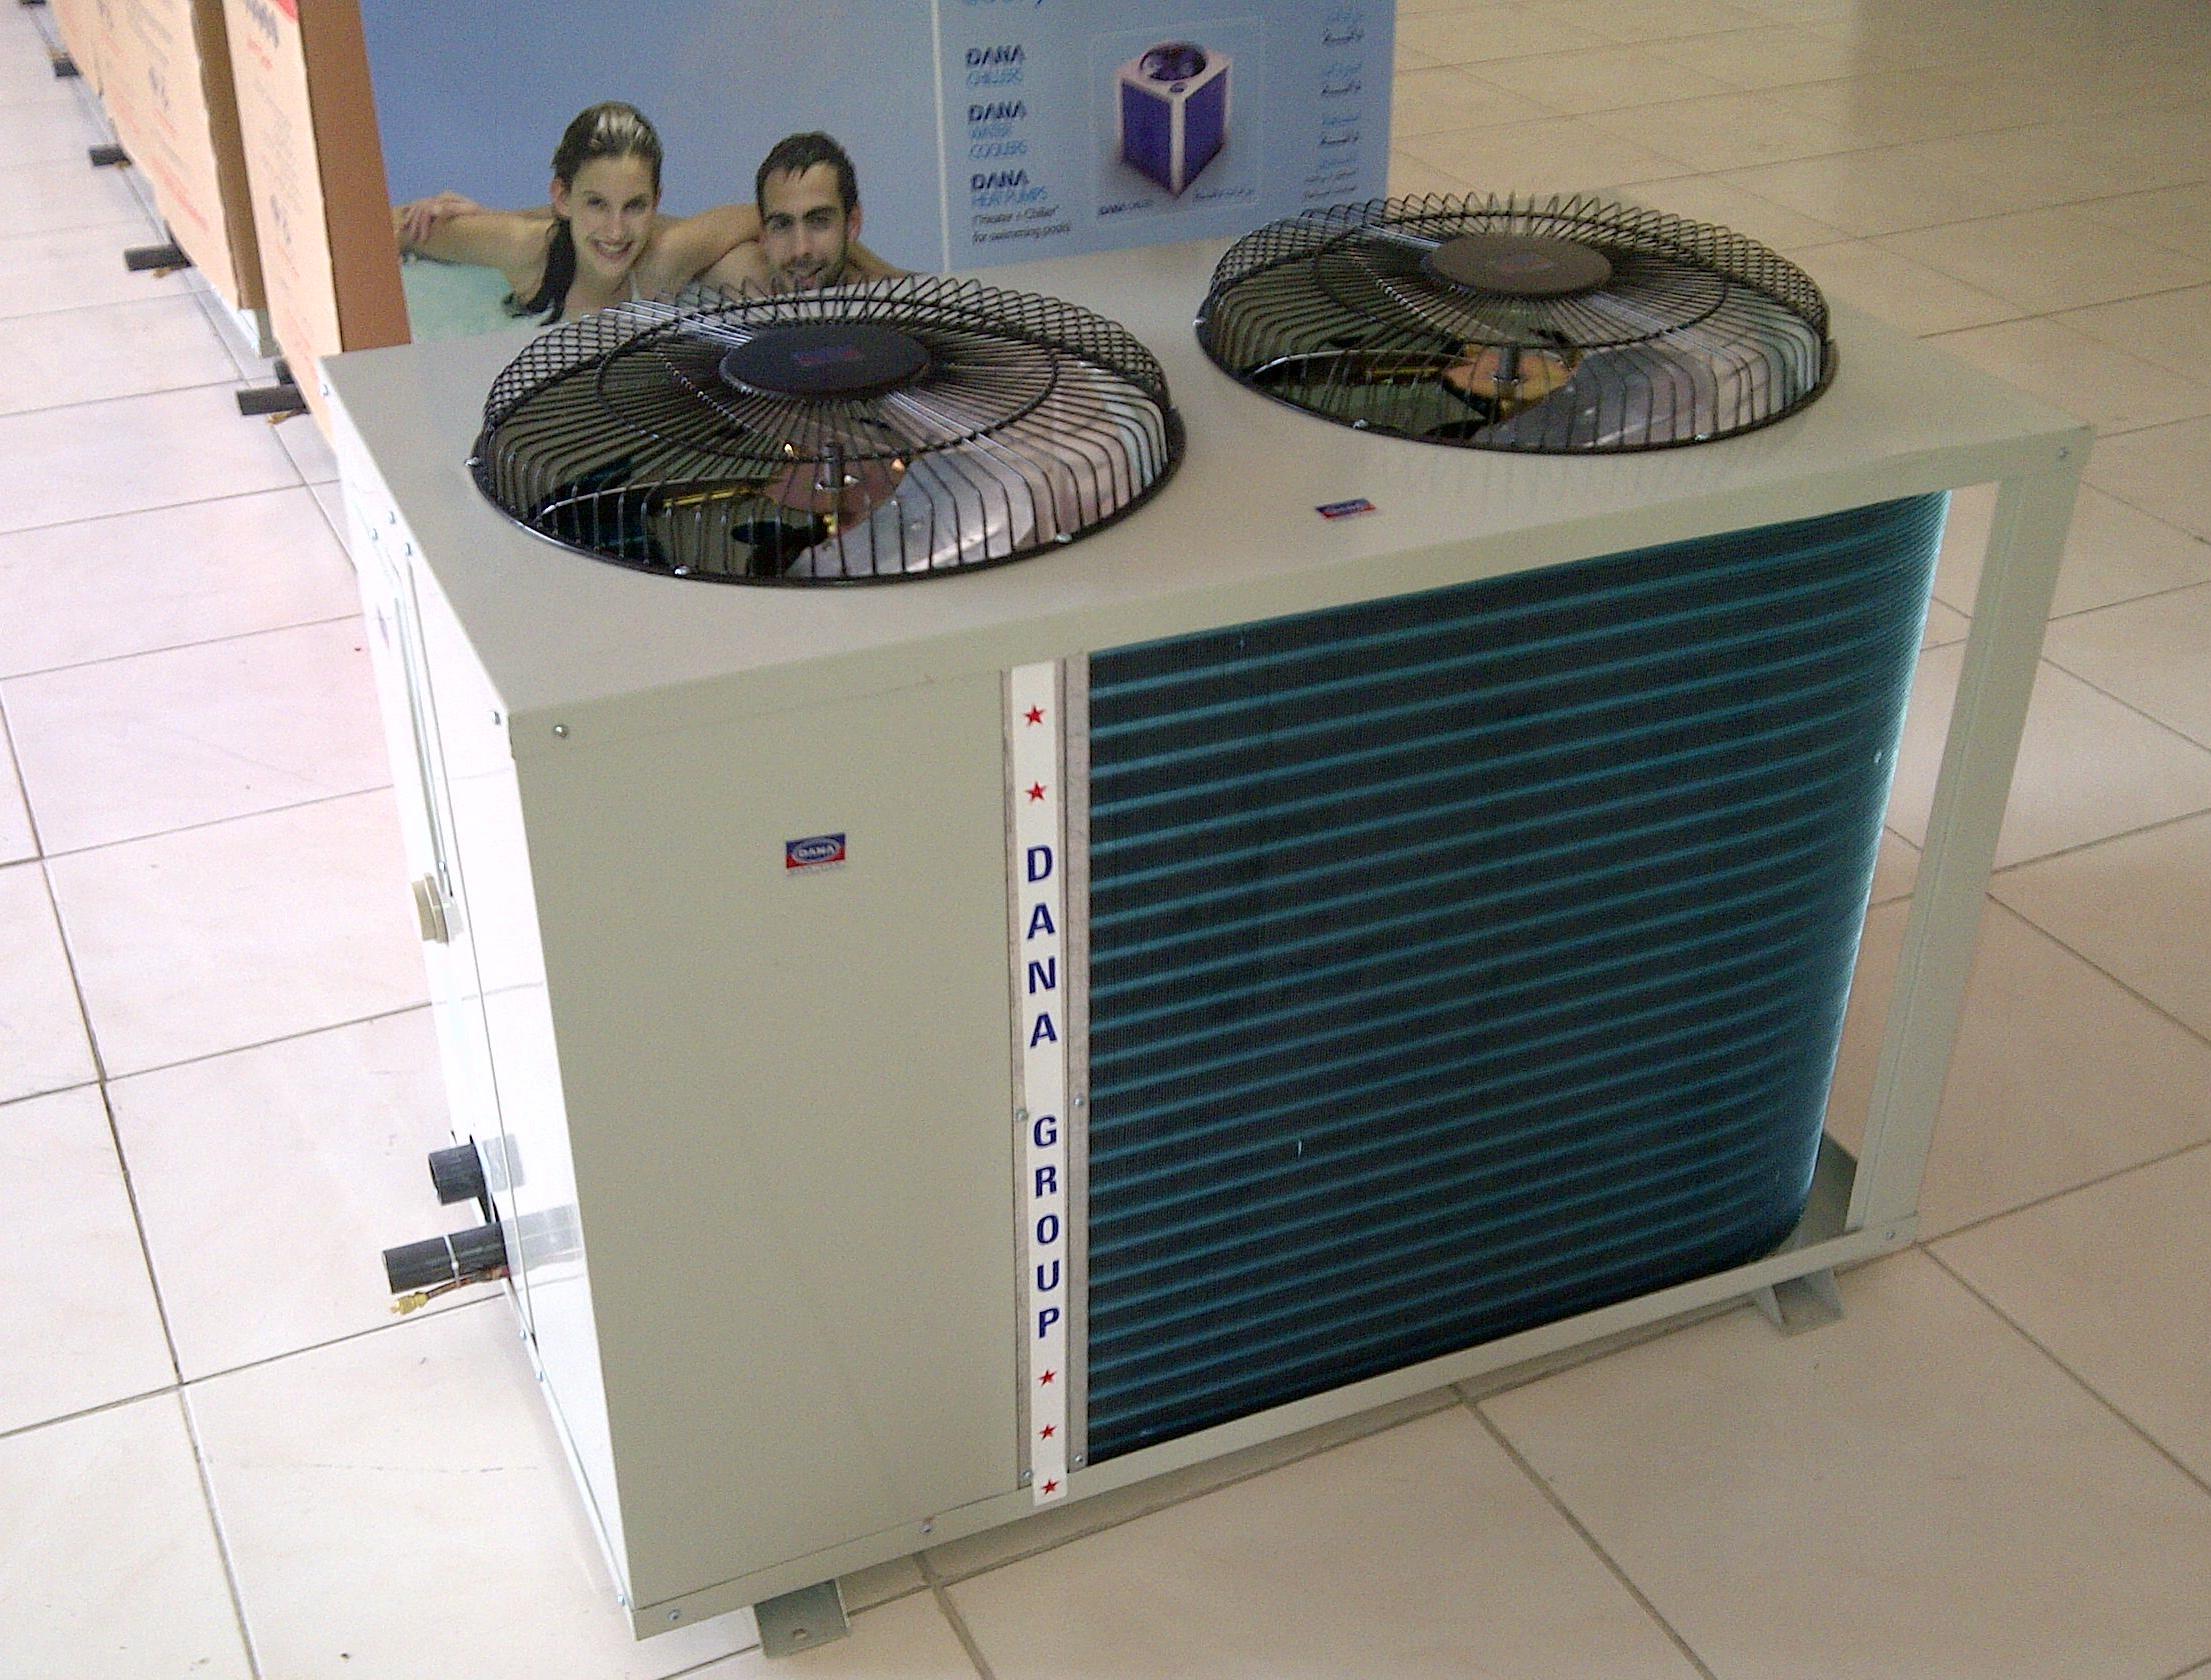 DANA Overhead Tank Water Chiller Cooling System Supplier UAE - Dubai - Ajman - Sharjah - Abu Dhabi